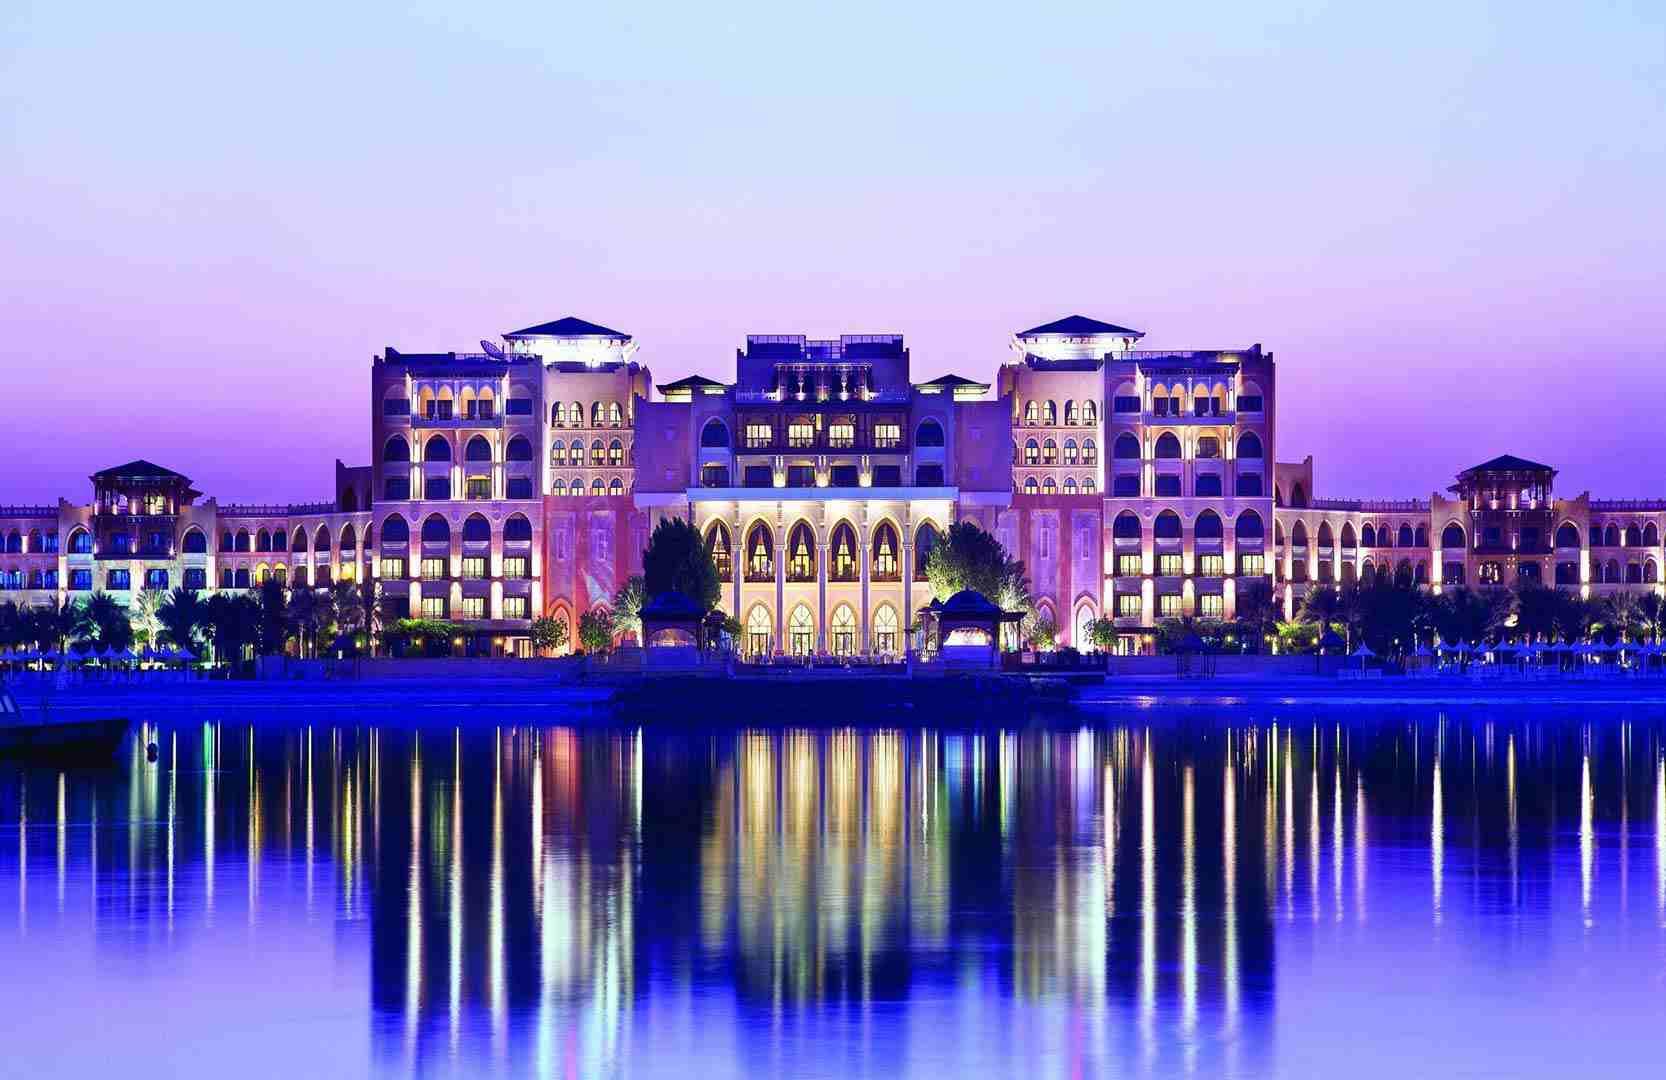 SHANGRI-LA-HOTELS-1558532848.jpg